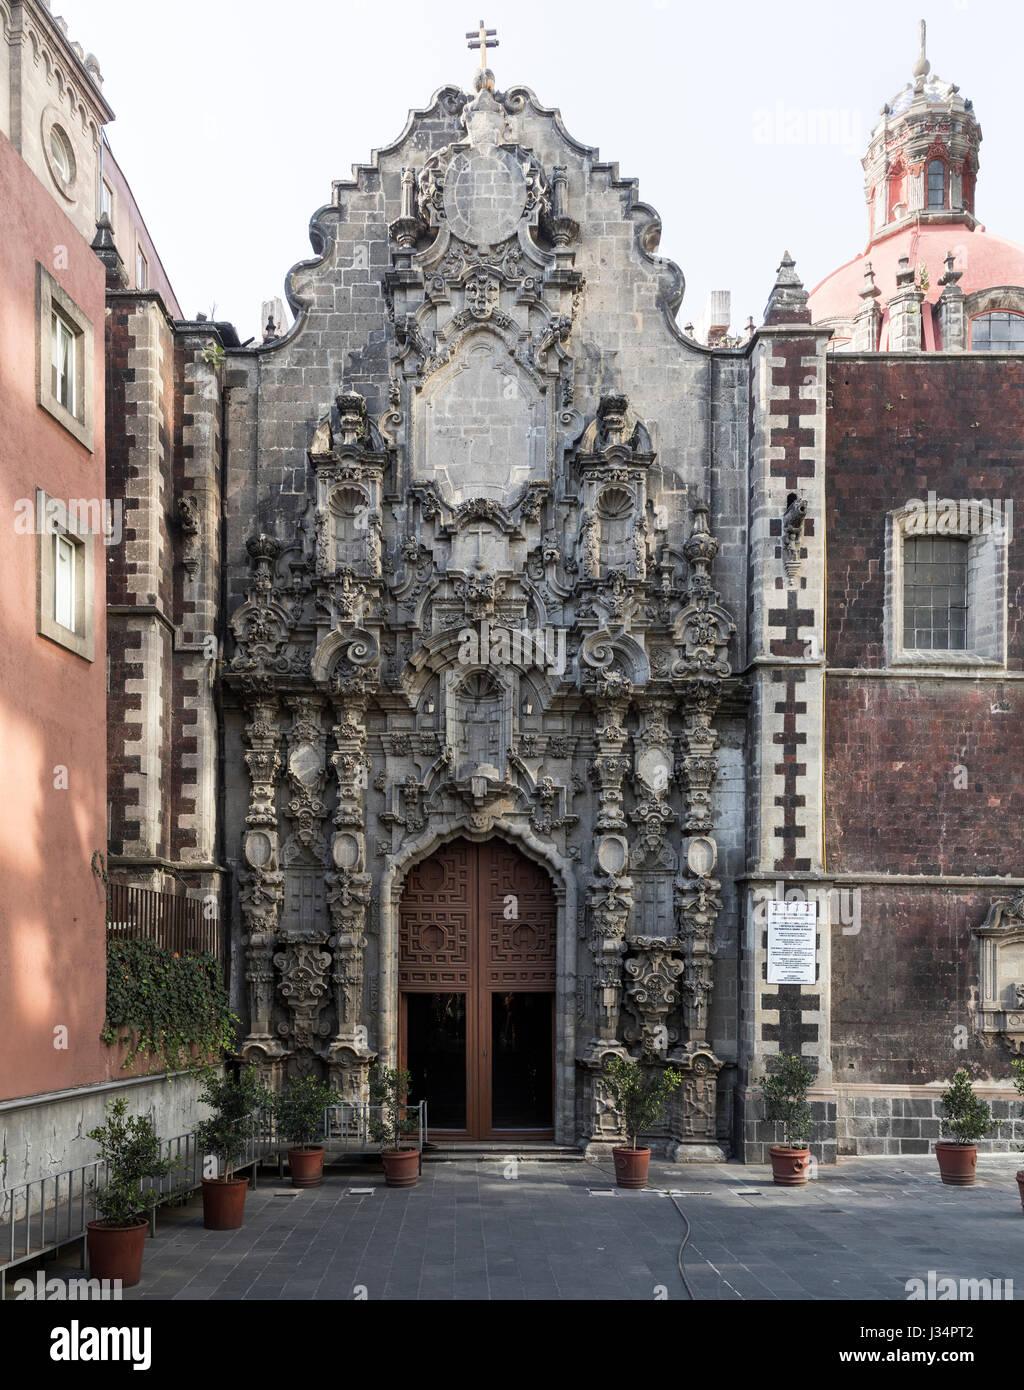 Mexico City, Mexico - 22 April 2017: Facade of Colonial era St Francis Church, Avenue Francisco Madero in the historic - Stock Image